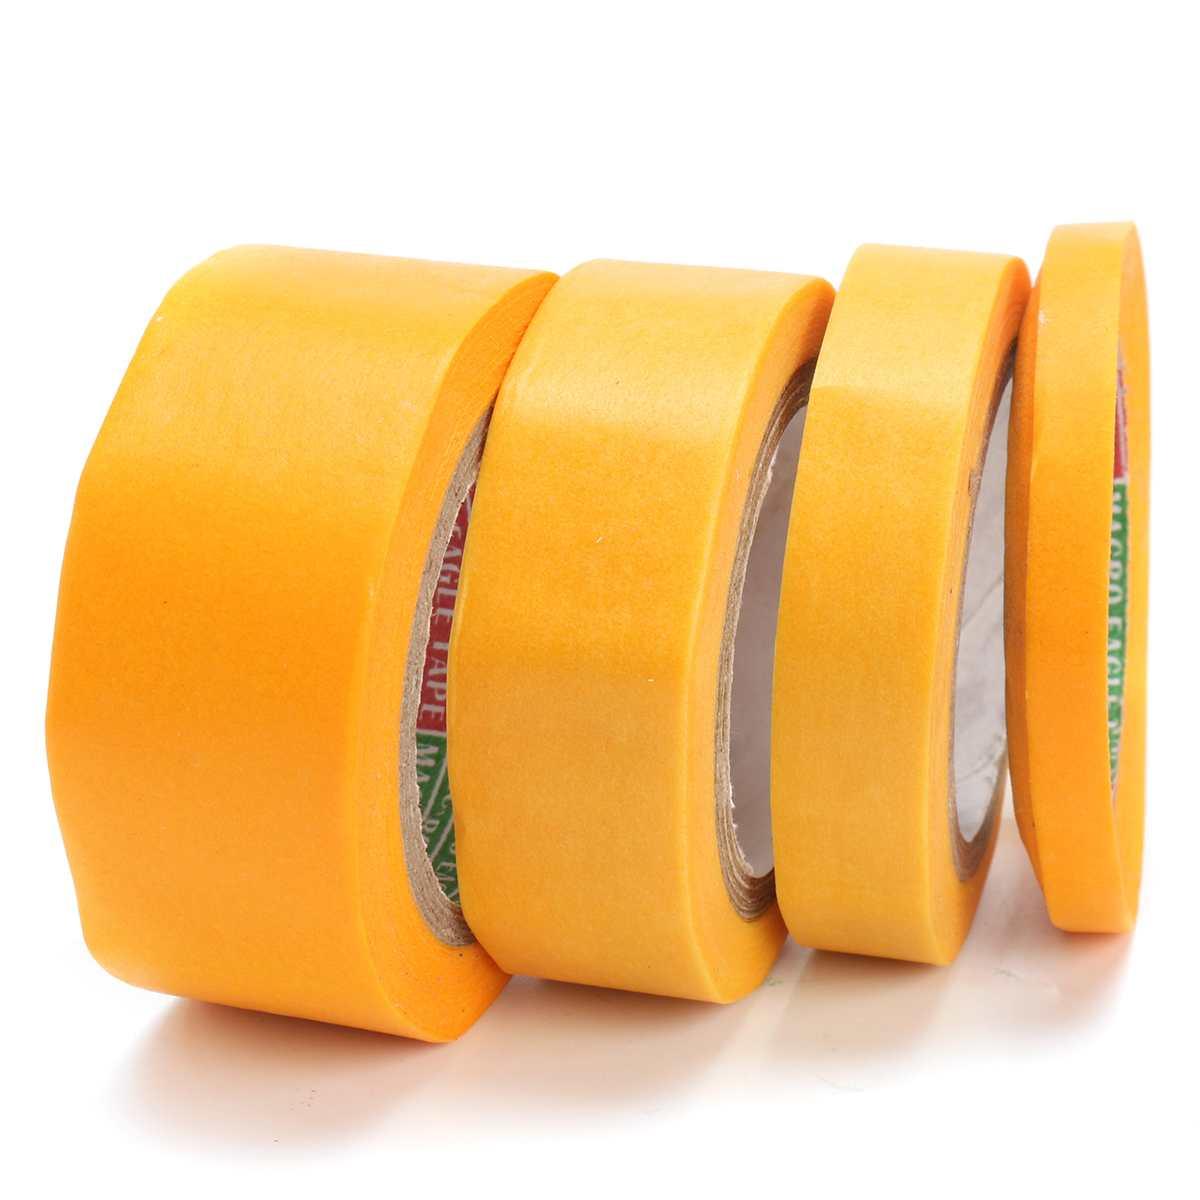 4 Size/ Set DIY Modeling Tools Craft Modeler Car Model Tool Paint Masking Tapes Paper-Masking-Tape Refinish